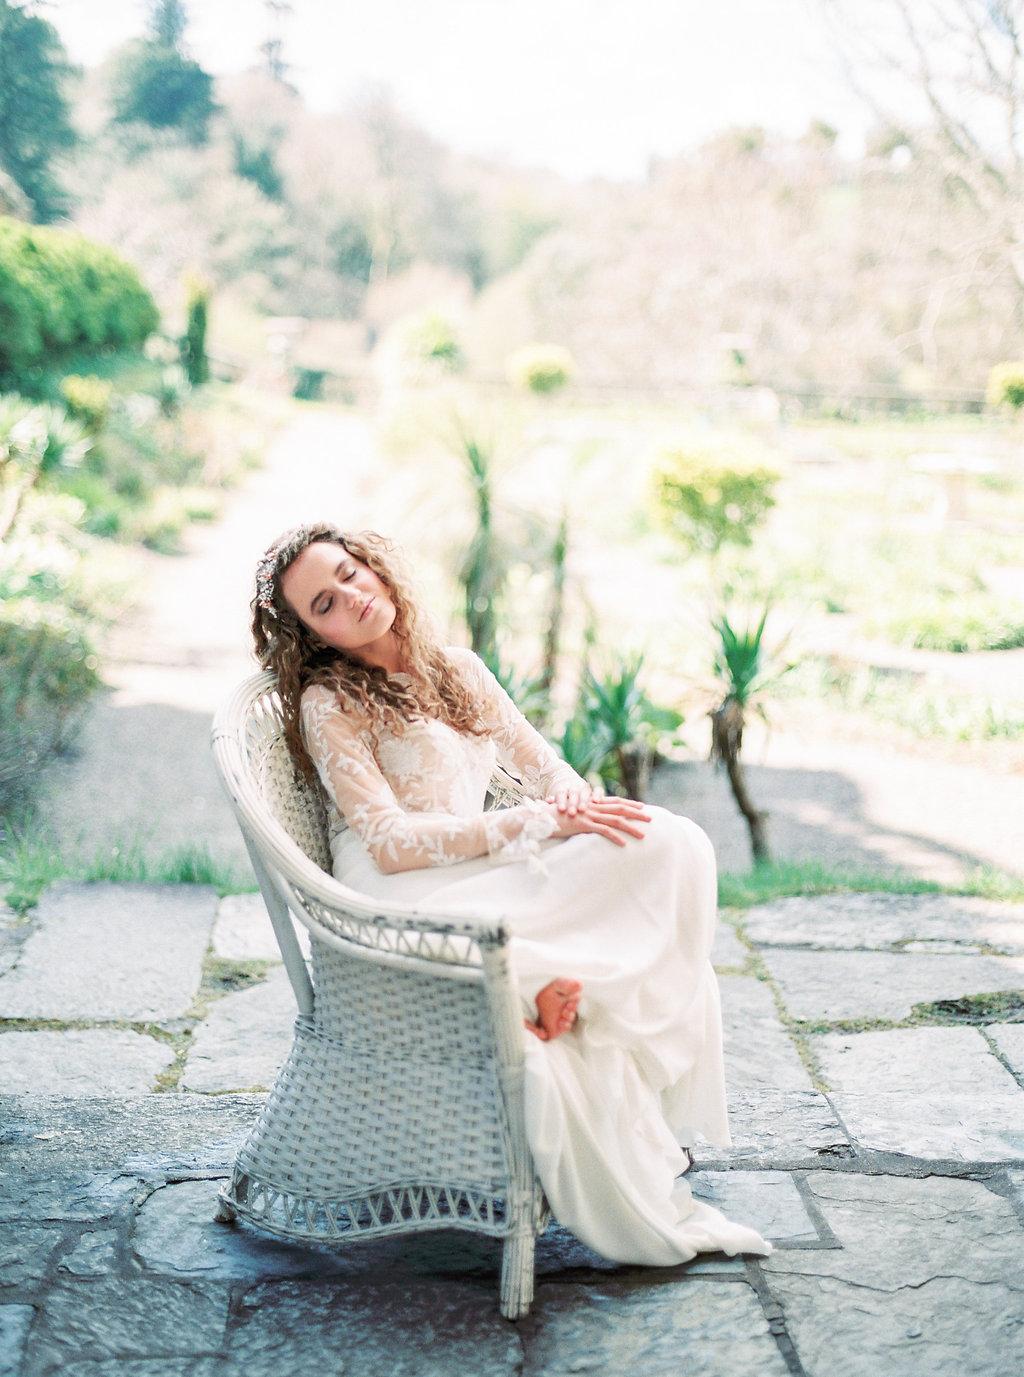 WeddingSparrow-PhotographybyIntoTheLight-Macias-lordan.com-ONLINESHARING(01dof50).jpg